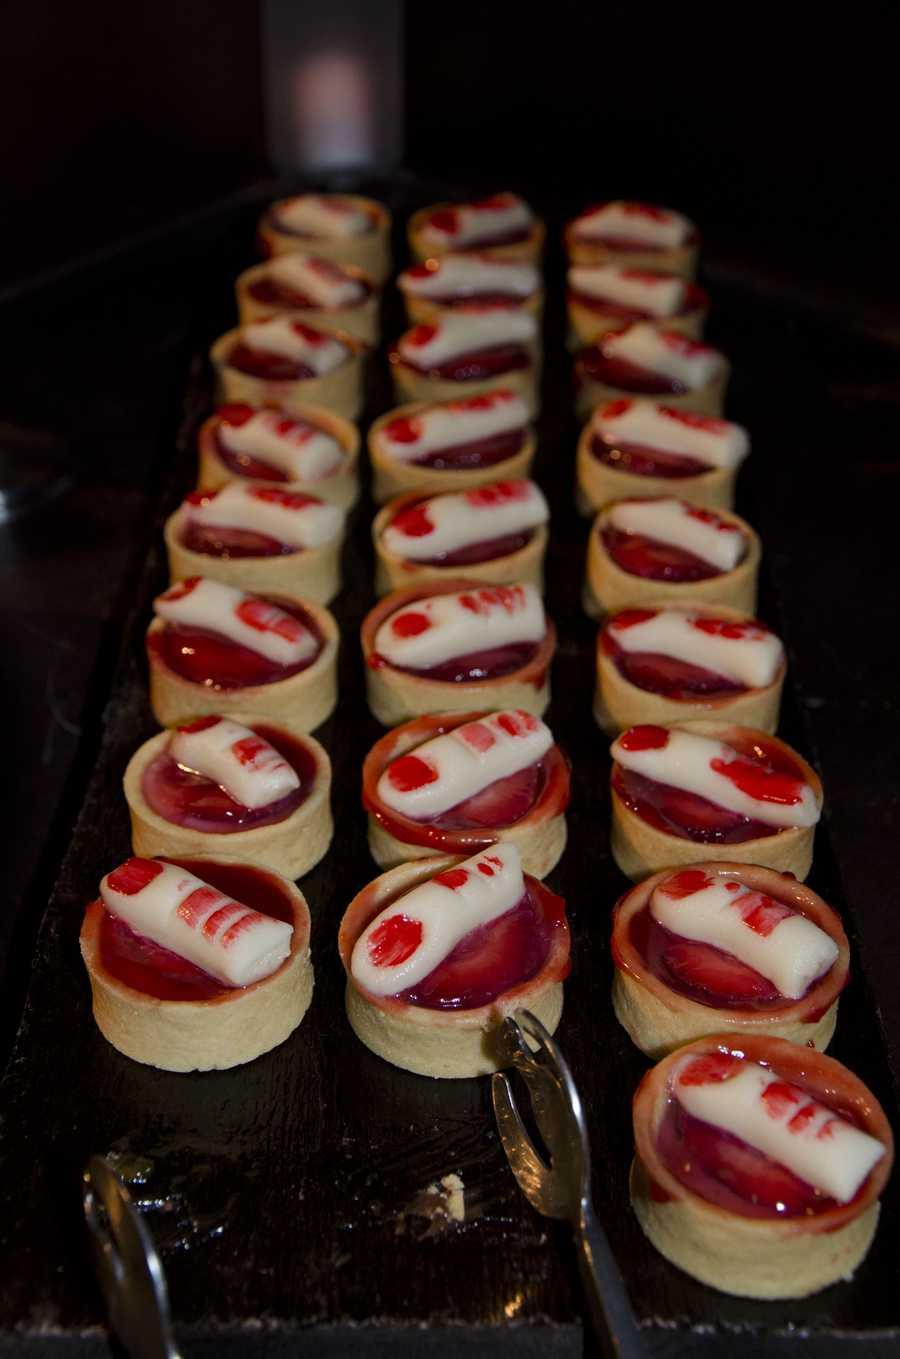 Bloody finger tarts